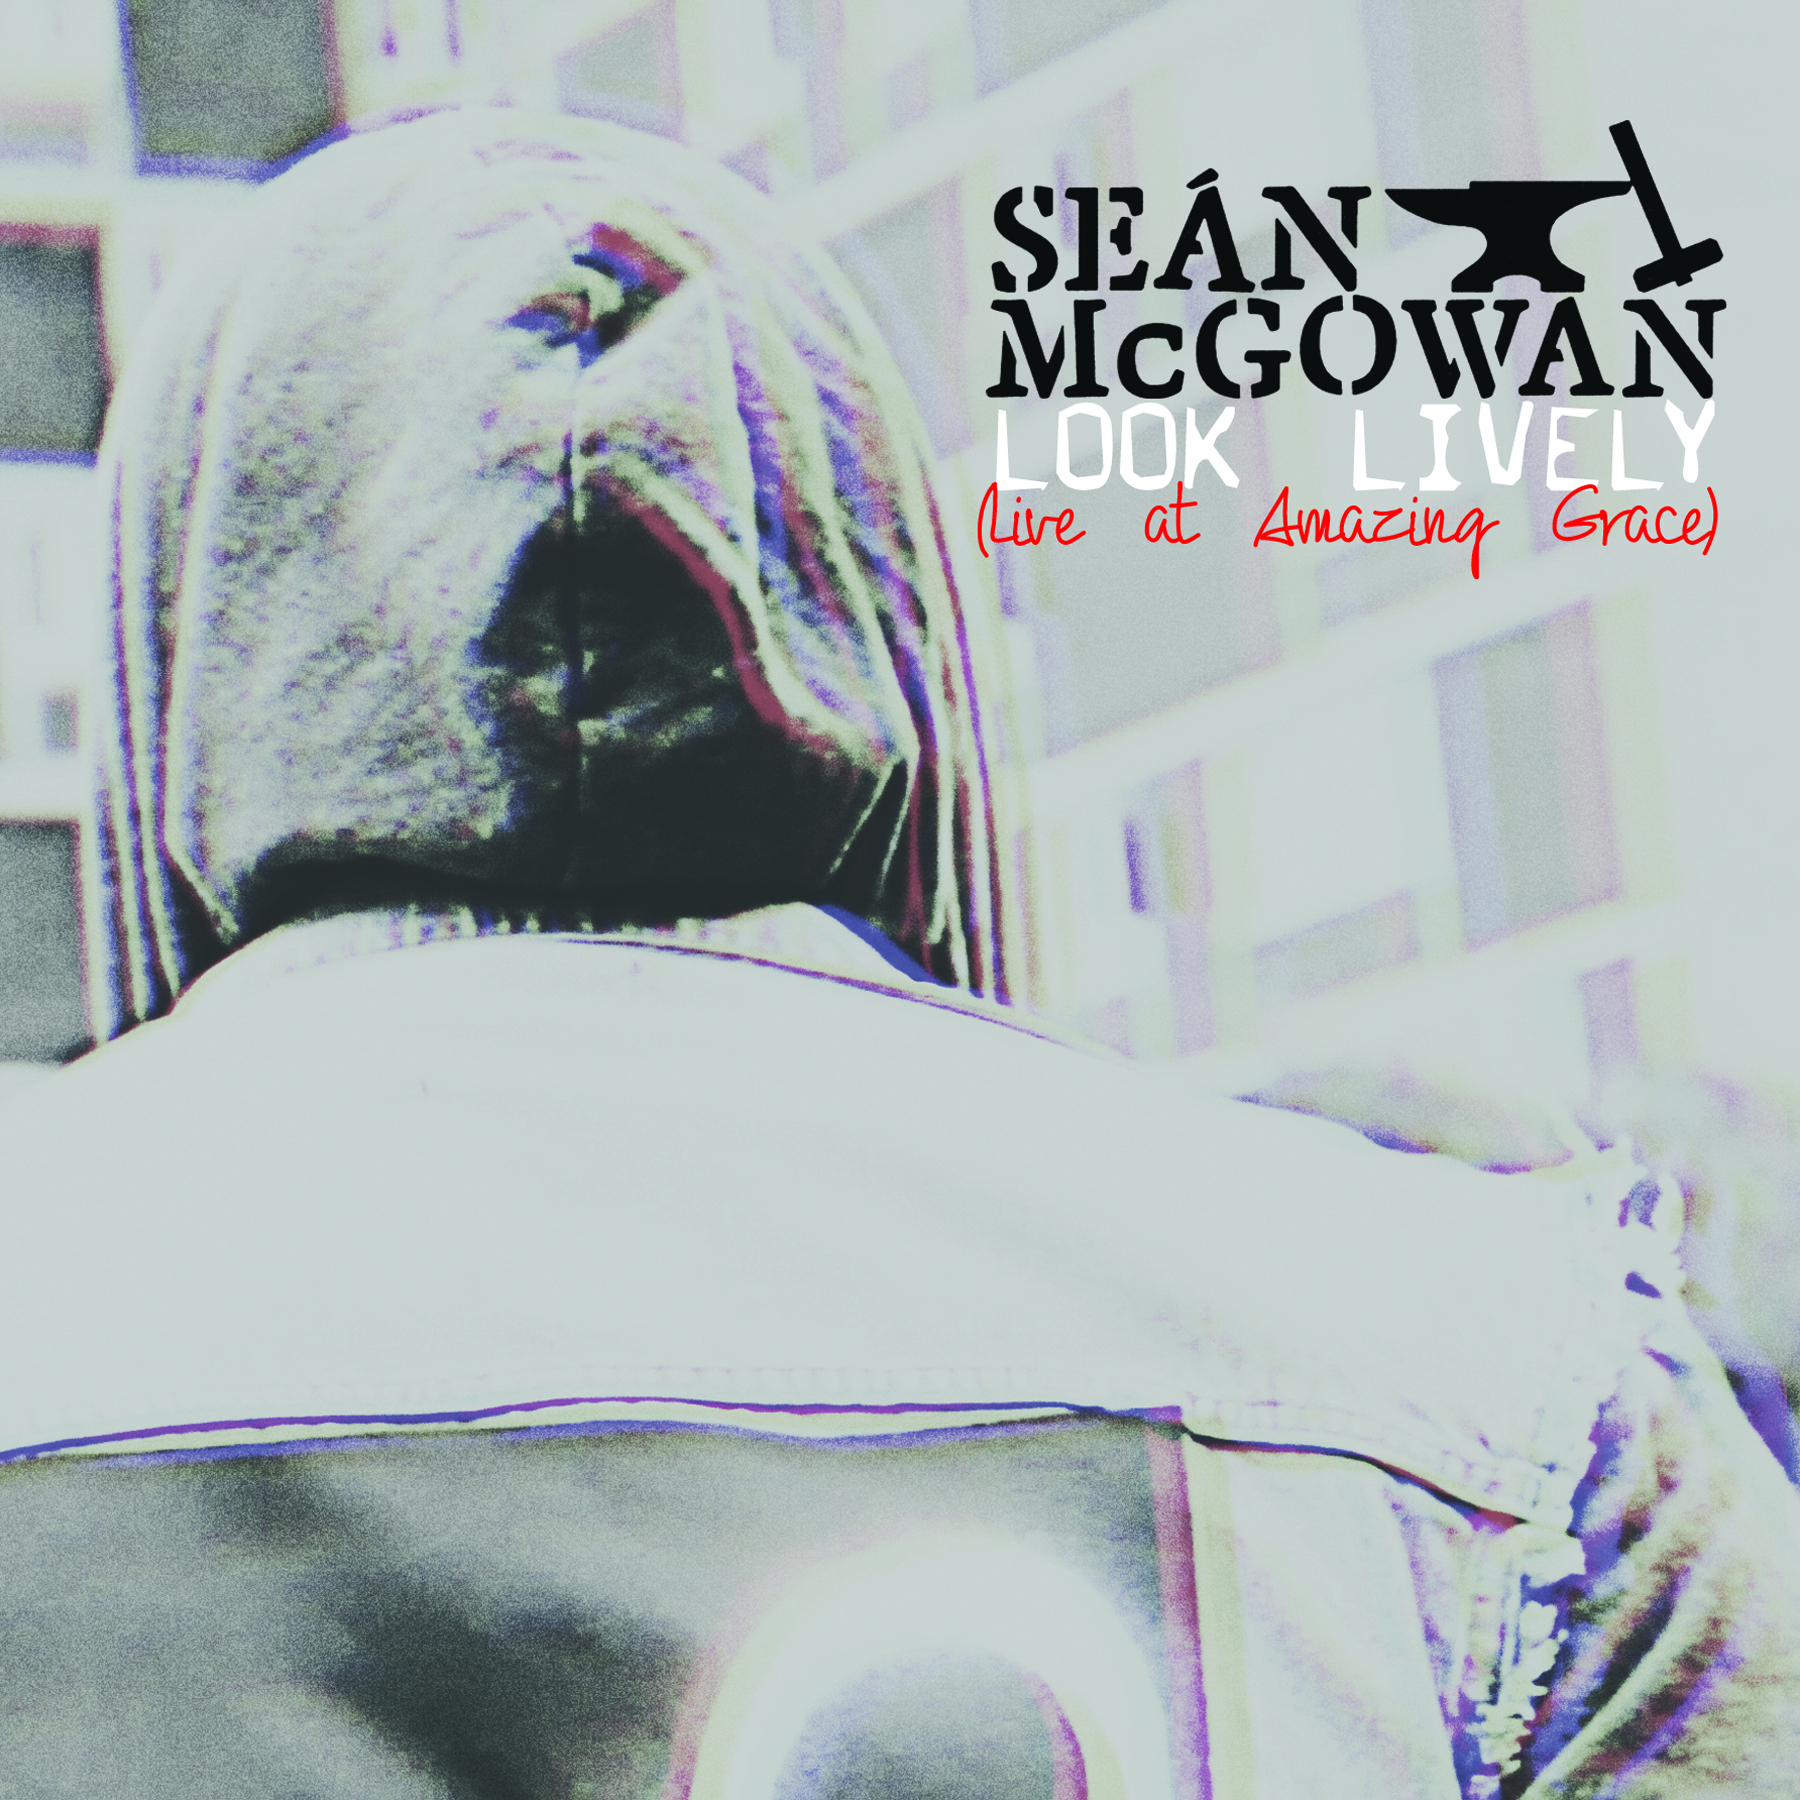 Seán McGowan - Look Lively (Live At Amazing Grace)